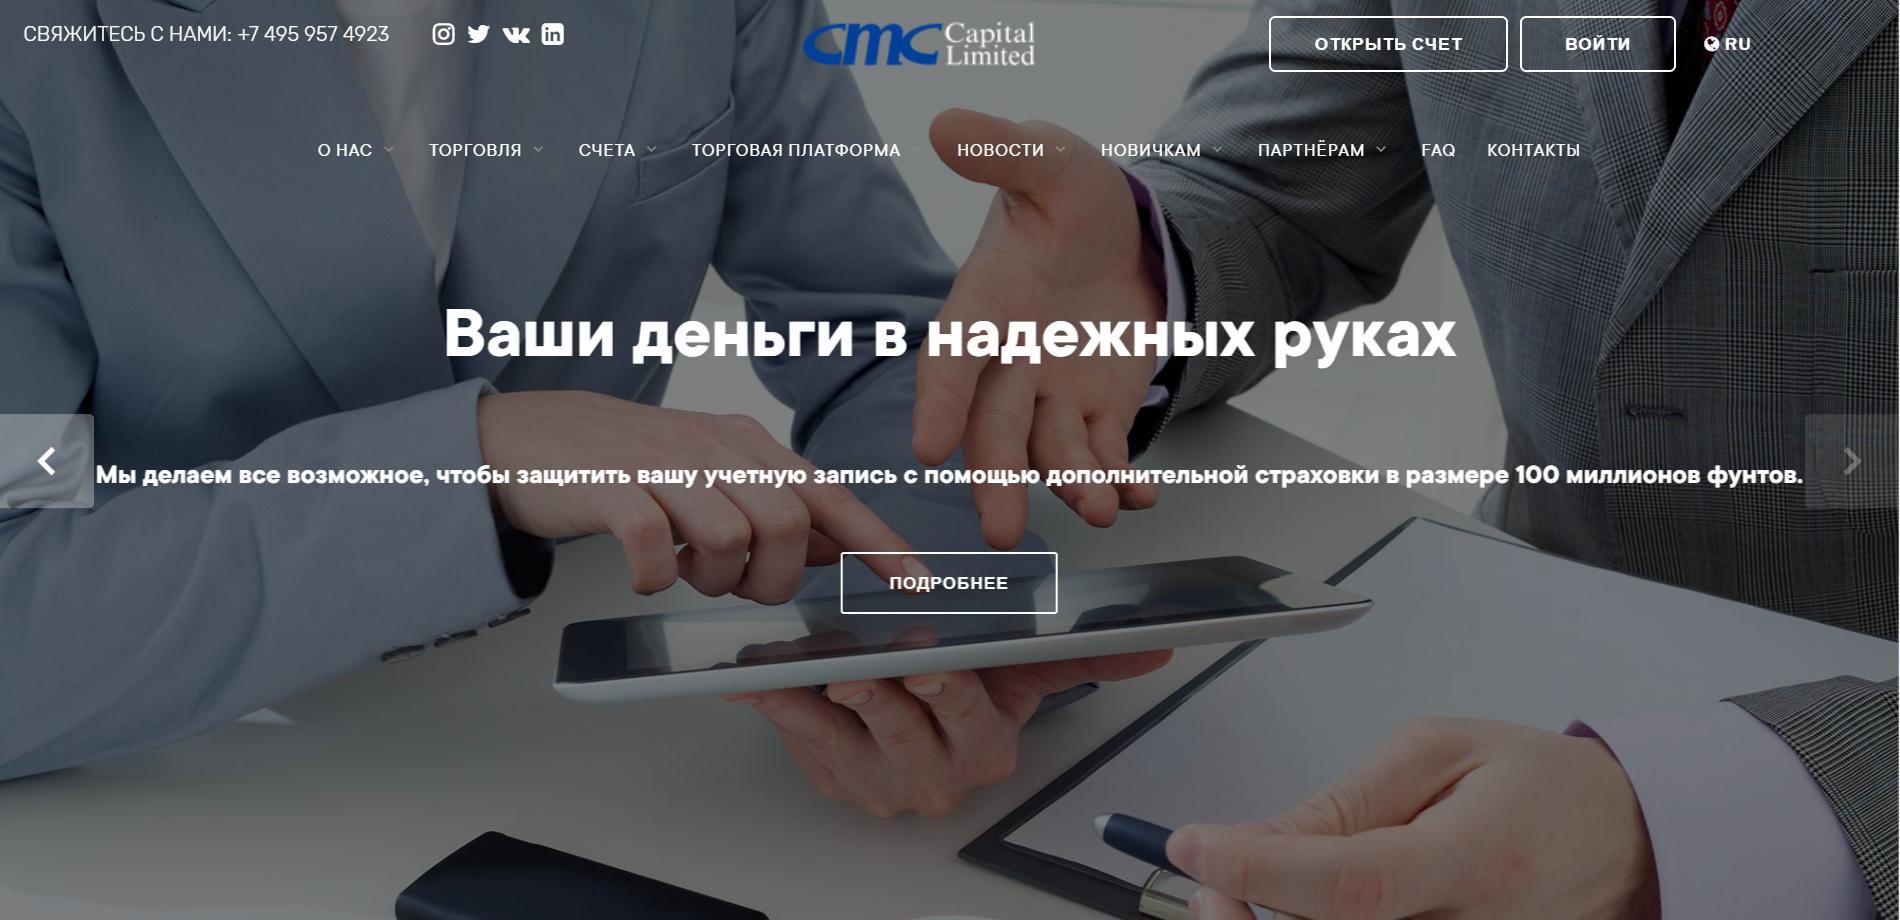 cmc capital отзывы